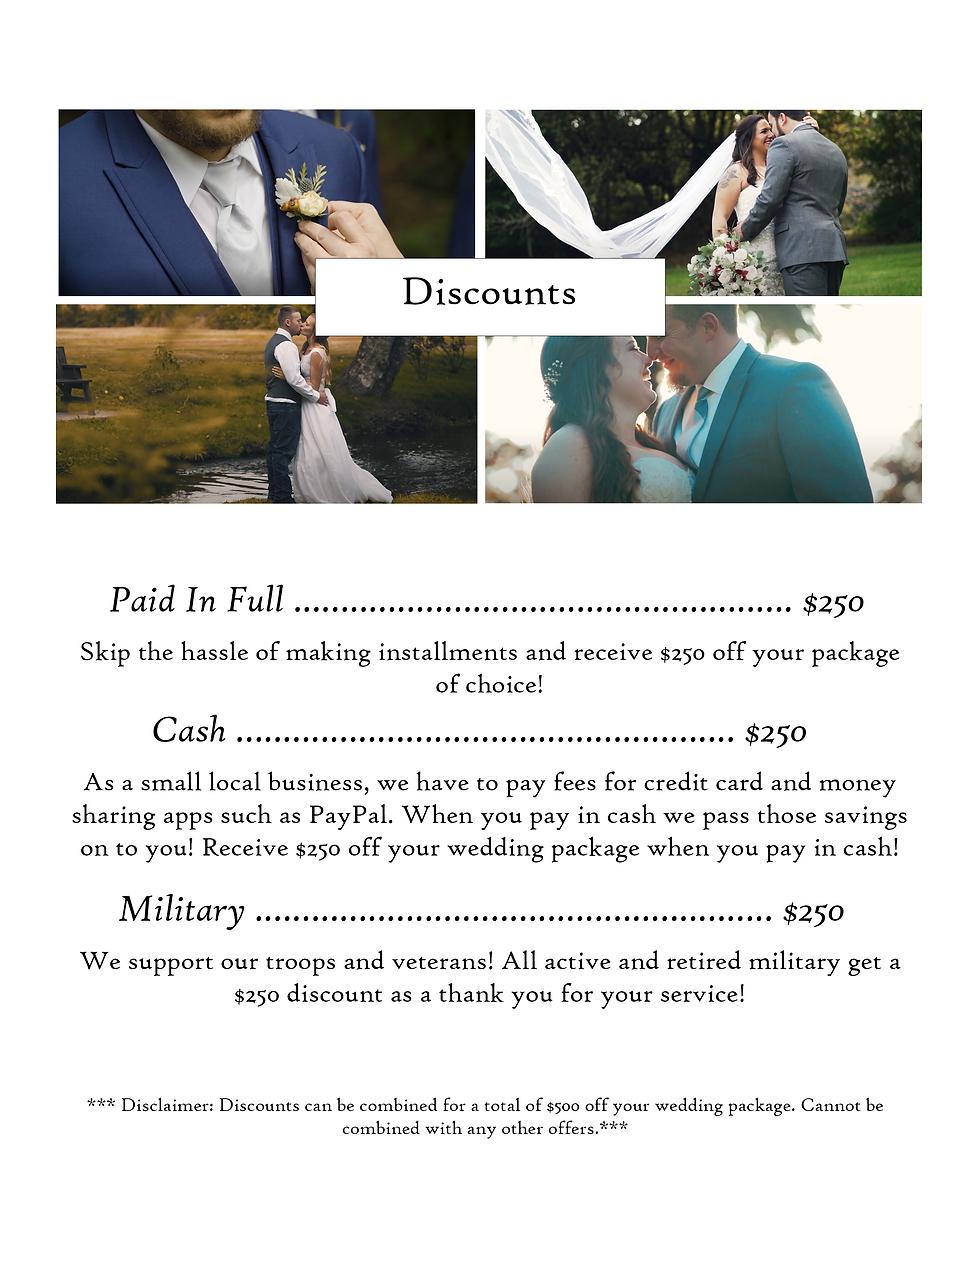 Wedding Discounts.png